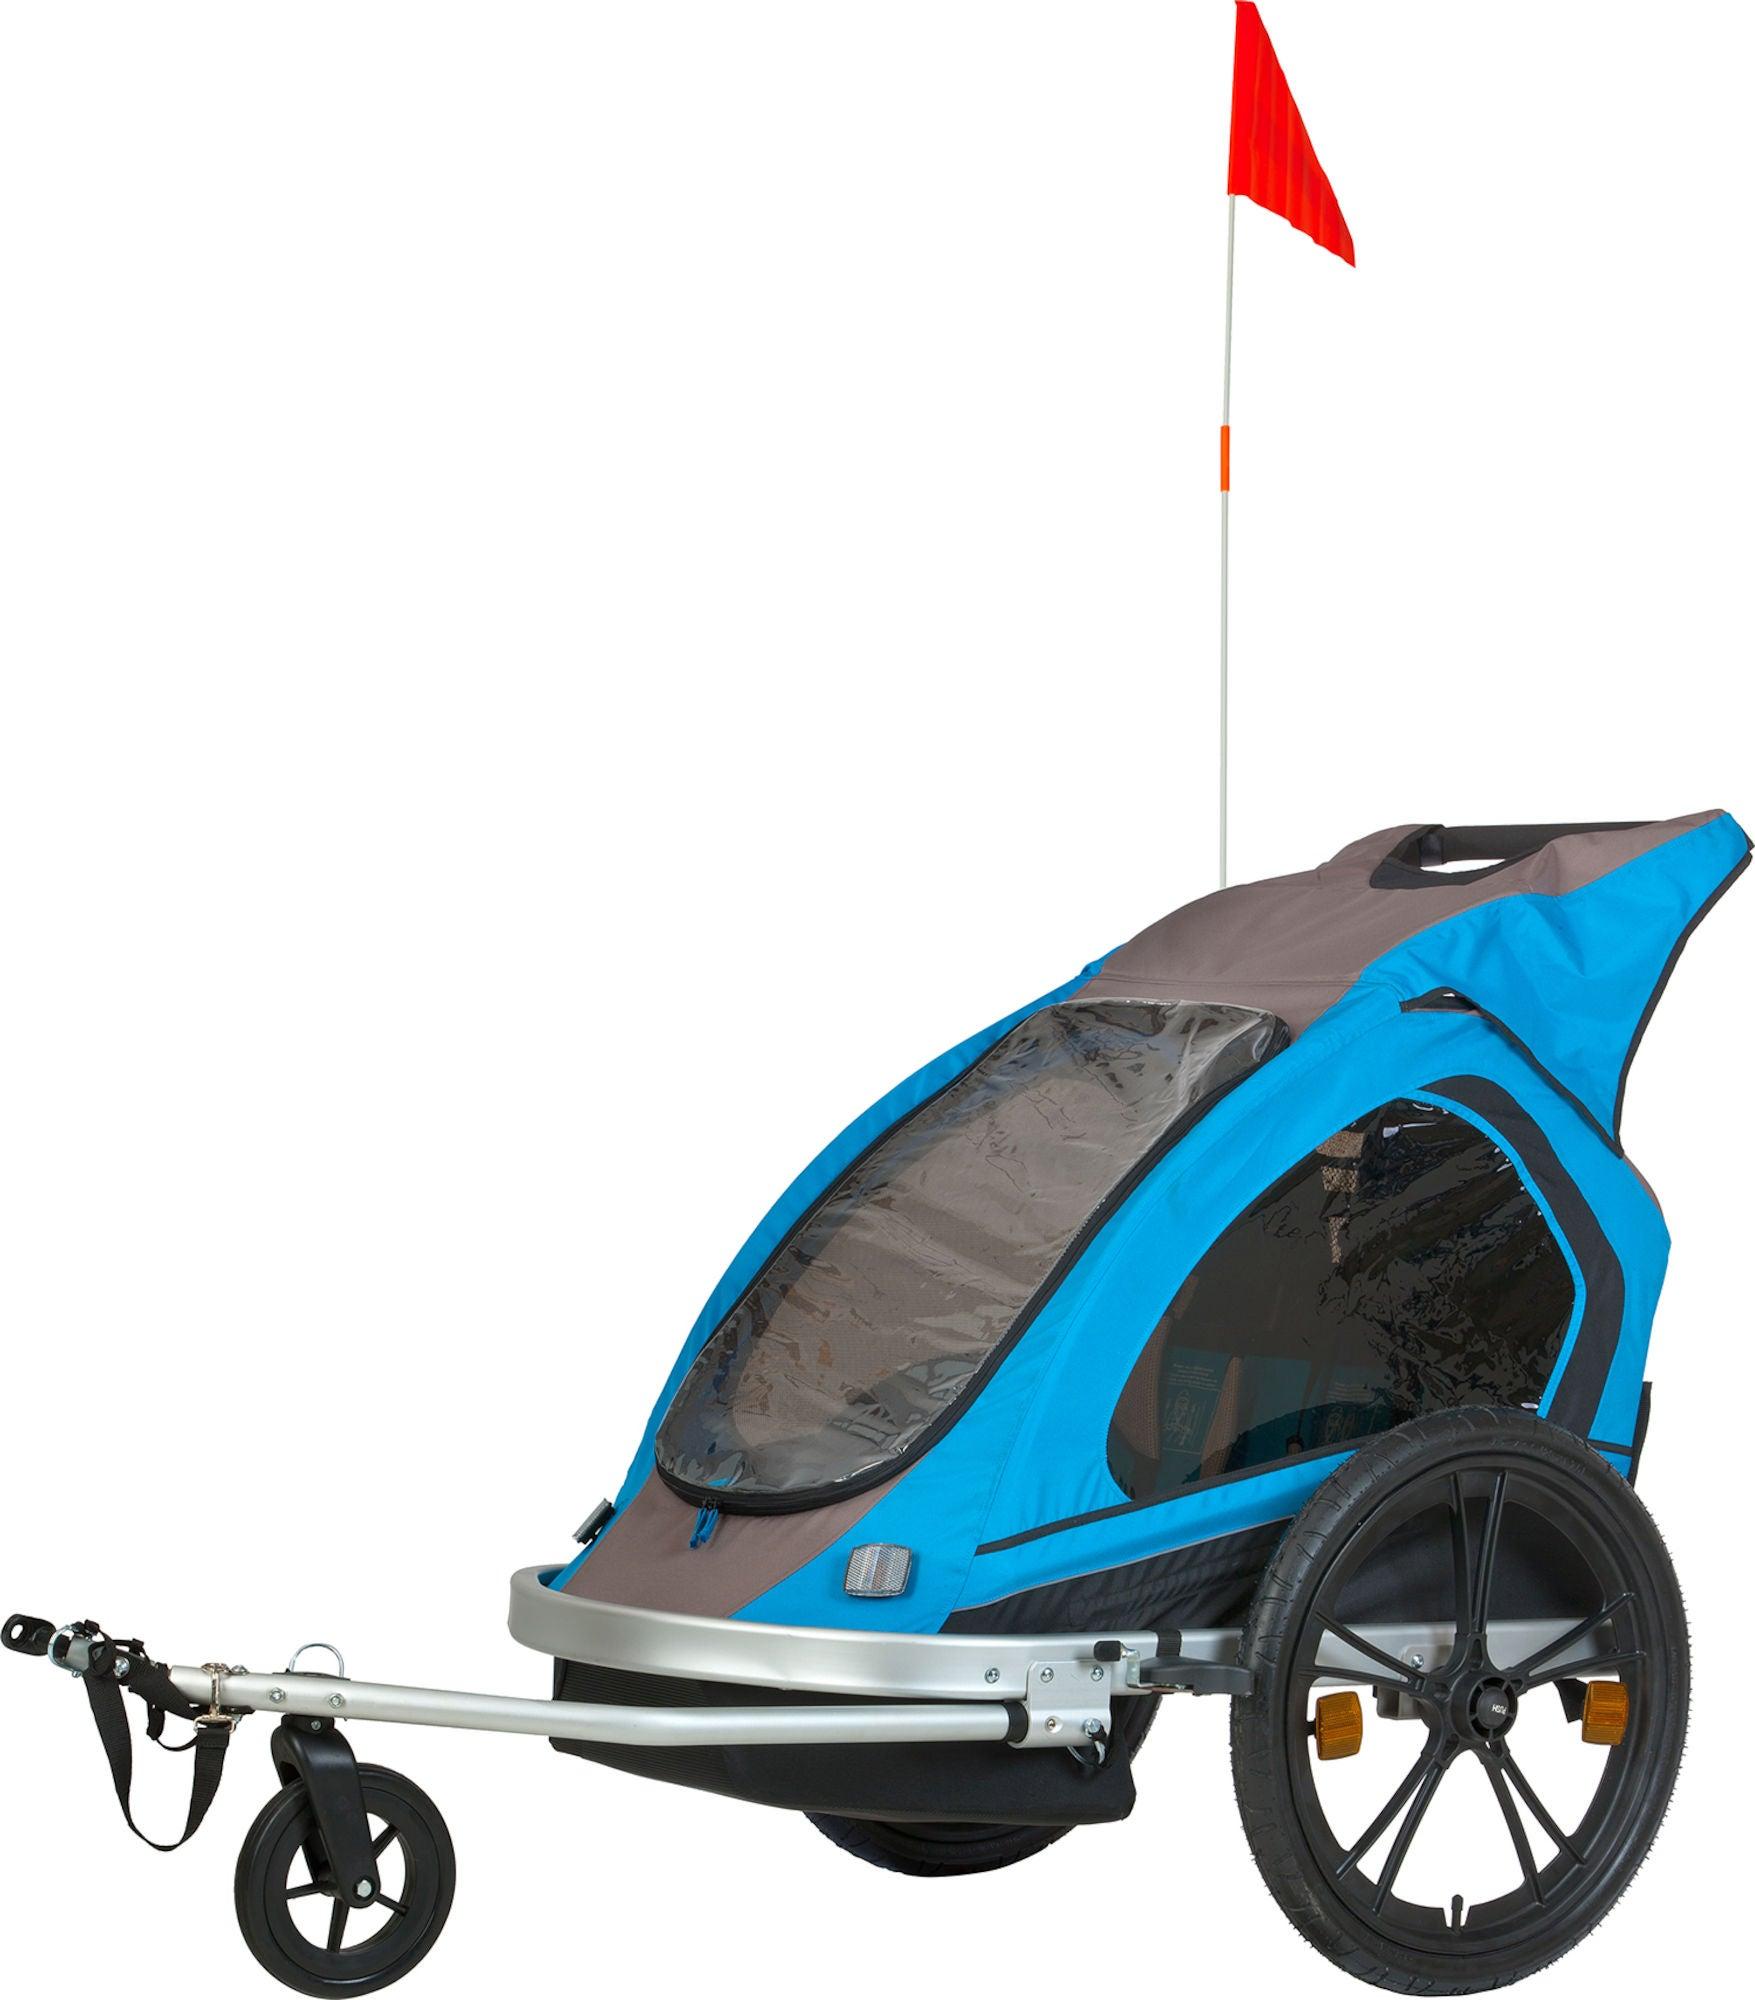 Spectra Cykelvagn Aluminium, Blå/Grön